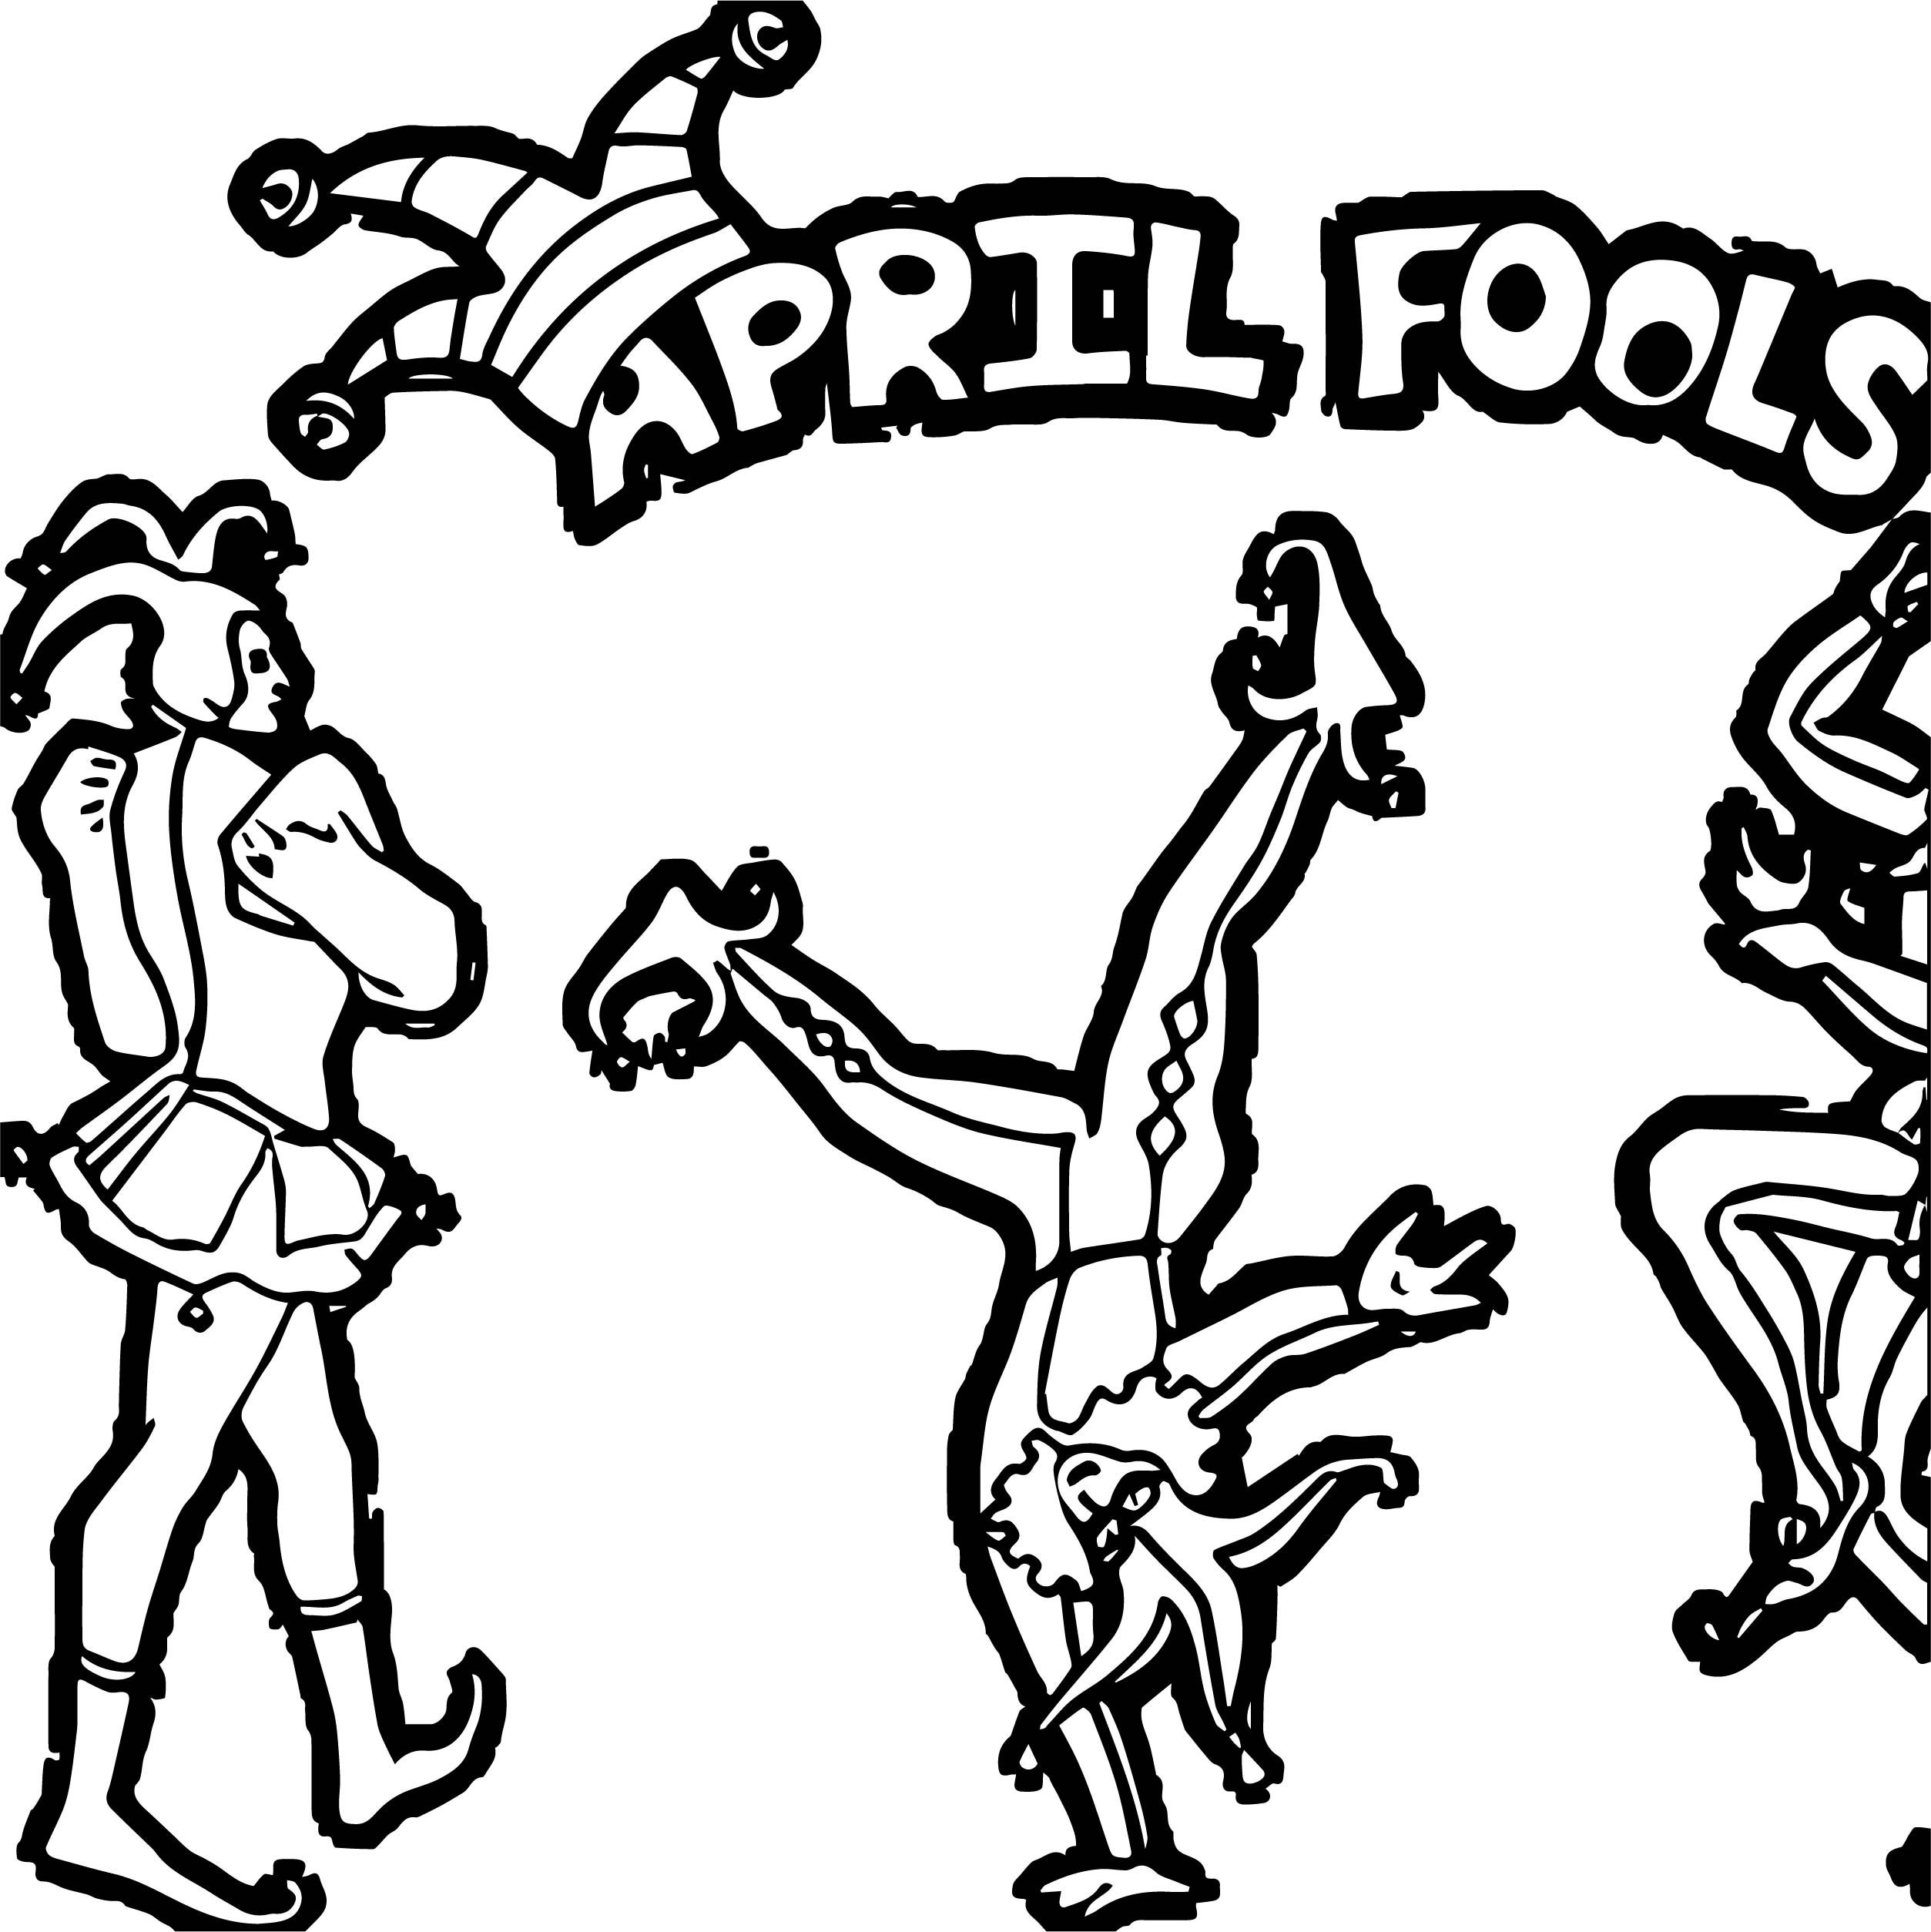 April Fool Circus Coloring Page